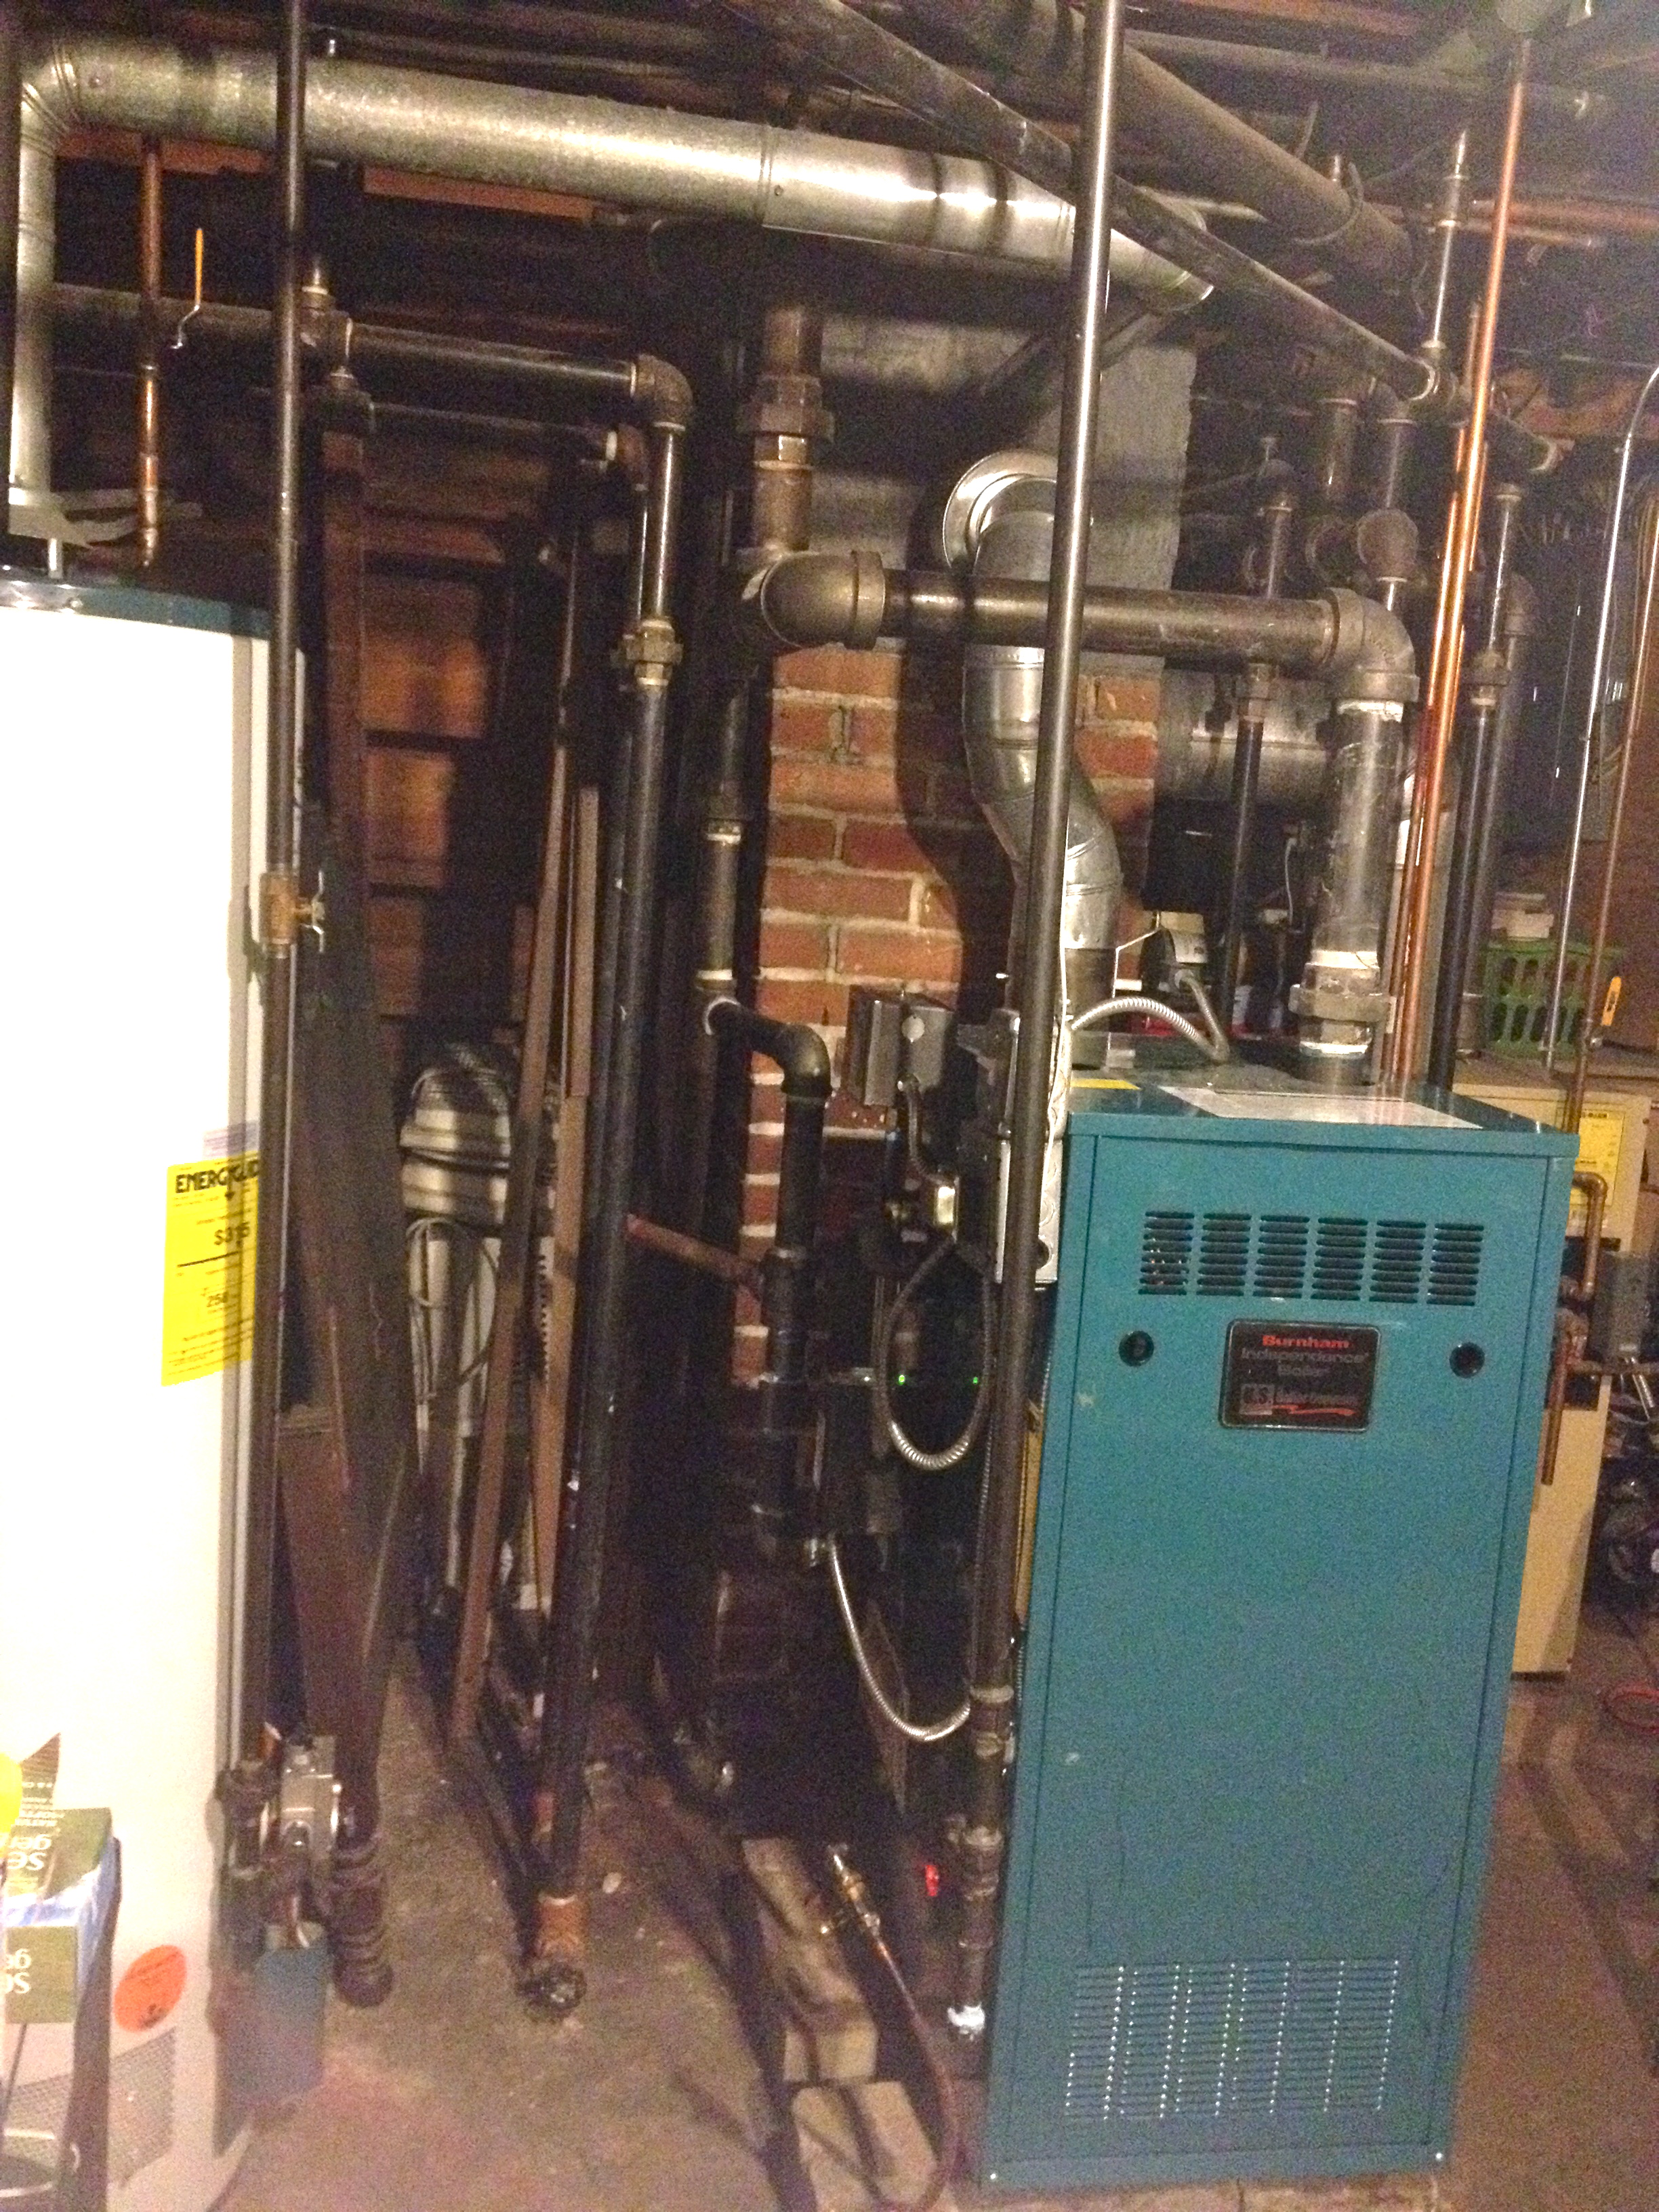 Air Vent Leaking On 1 Pipe Steam Radiator Heating Help